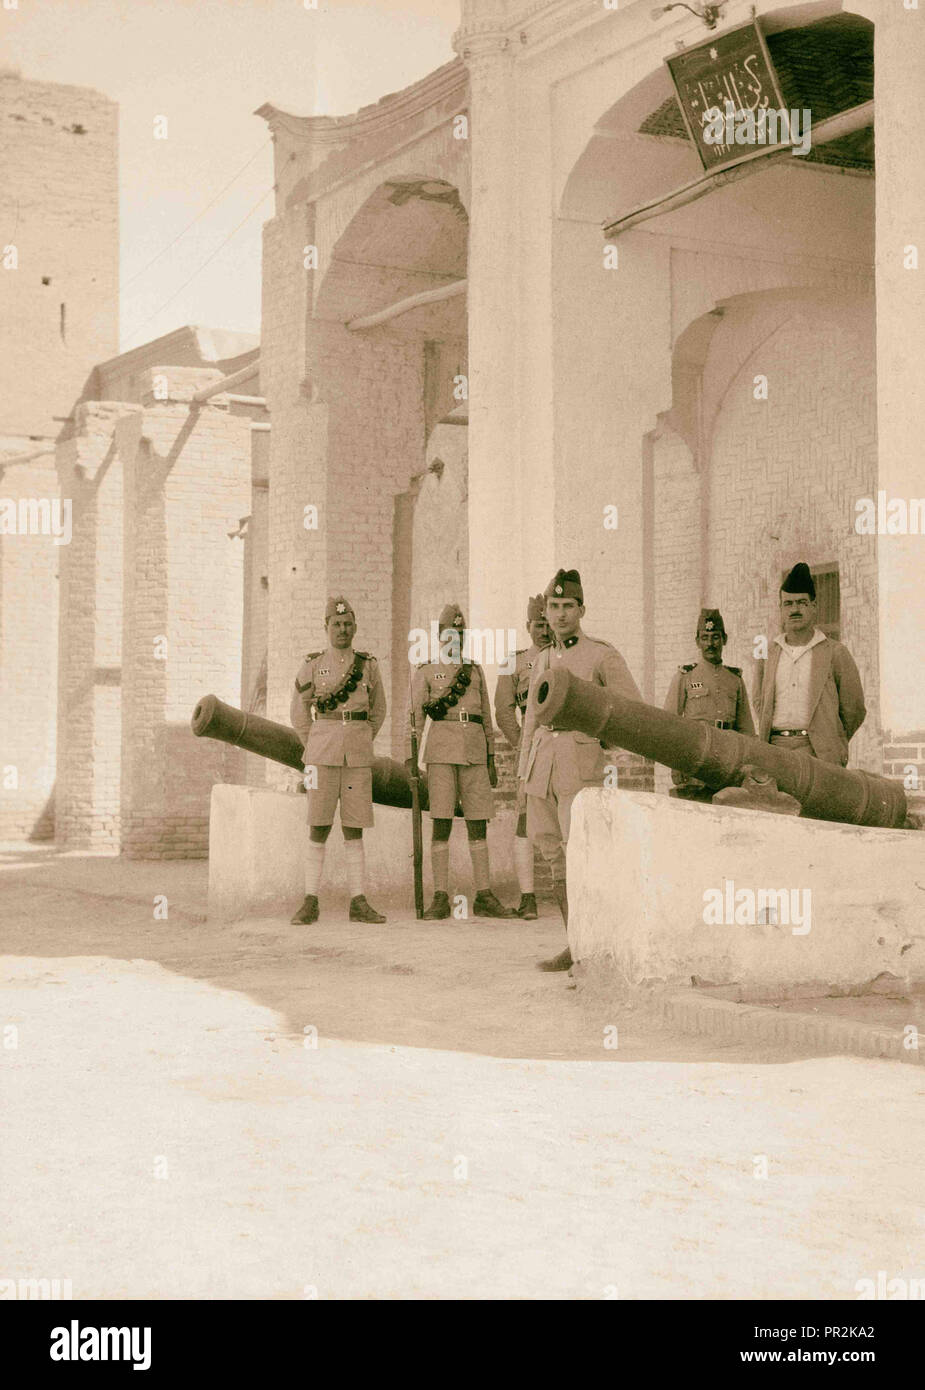 Iraq. Nejaf. First sacred city of the Shiite Moslems [i.e., Muslims]. Police headquarters. 1932, Iraq, Najaf - Stock Image